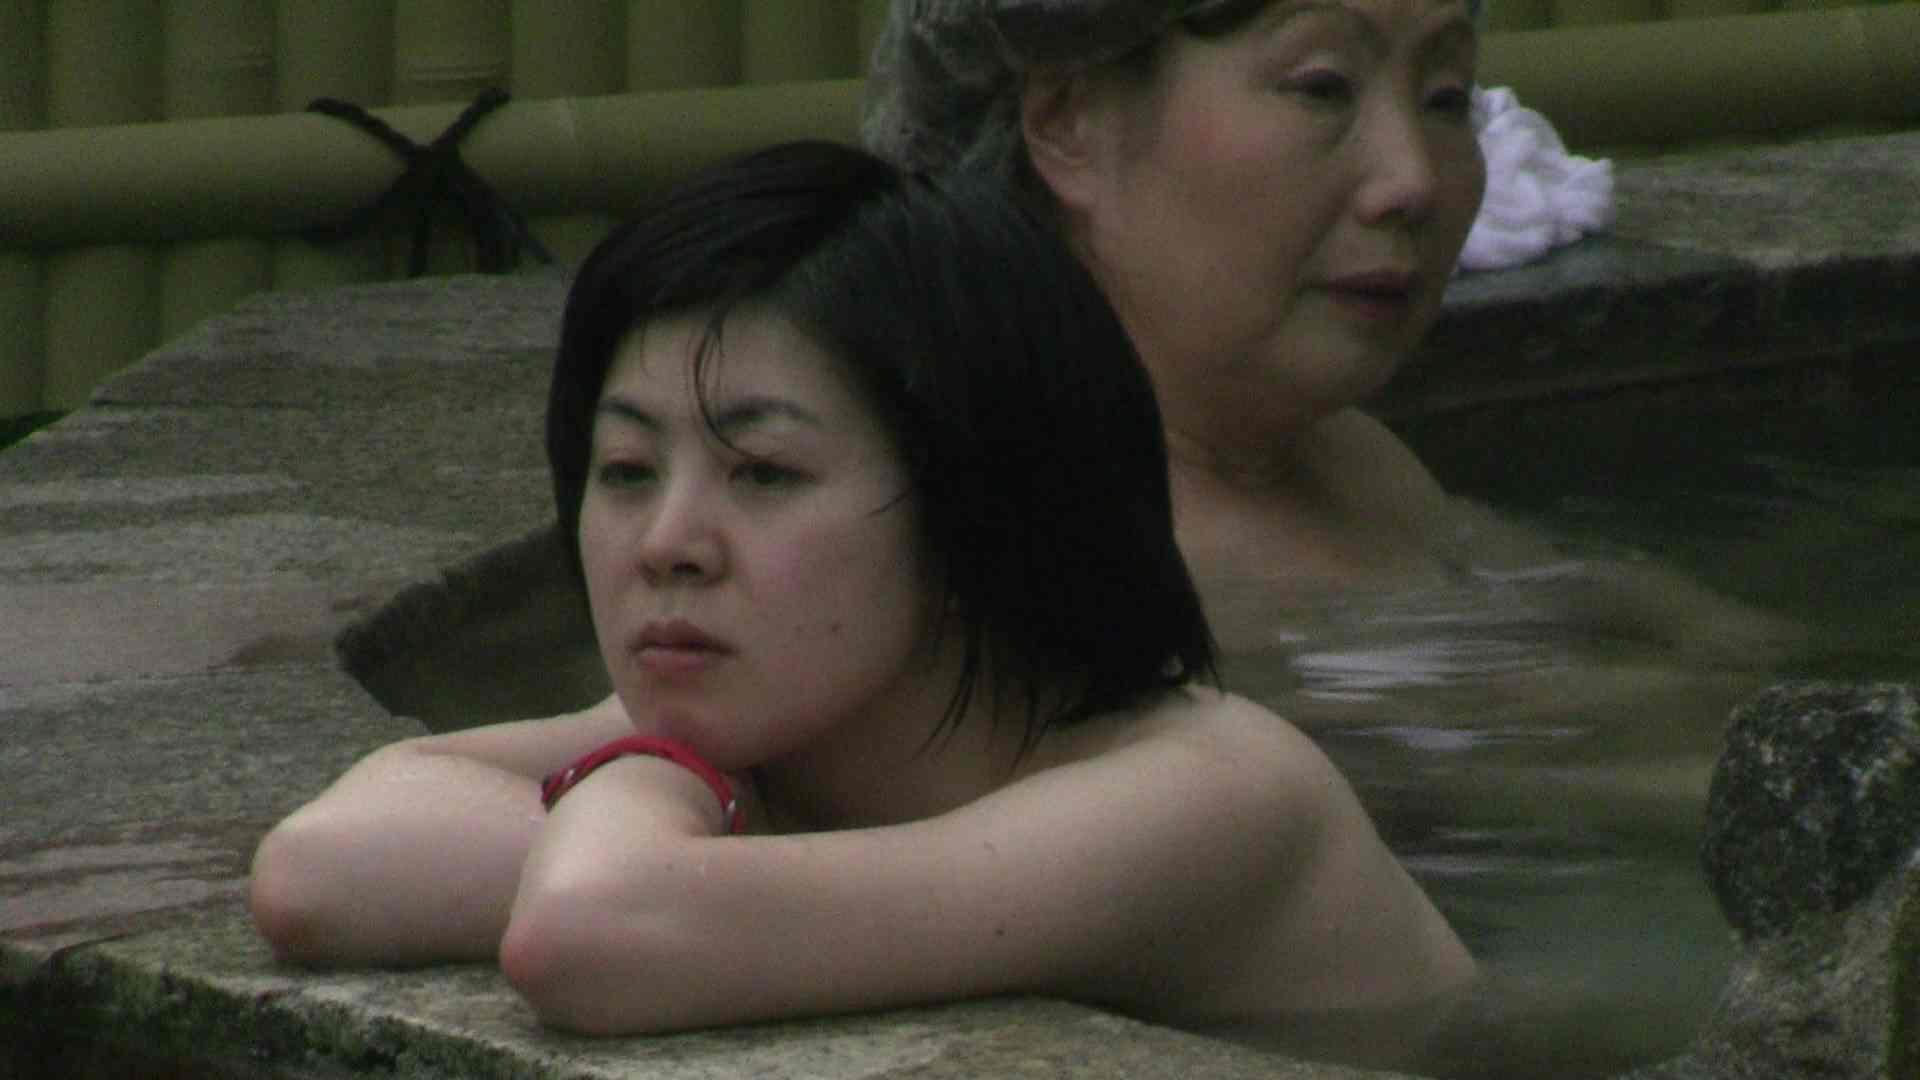 Aquaな露天風呂Vol.685 盗撮シリーズ | 露天風呂編  95PIX 9